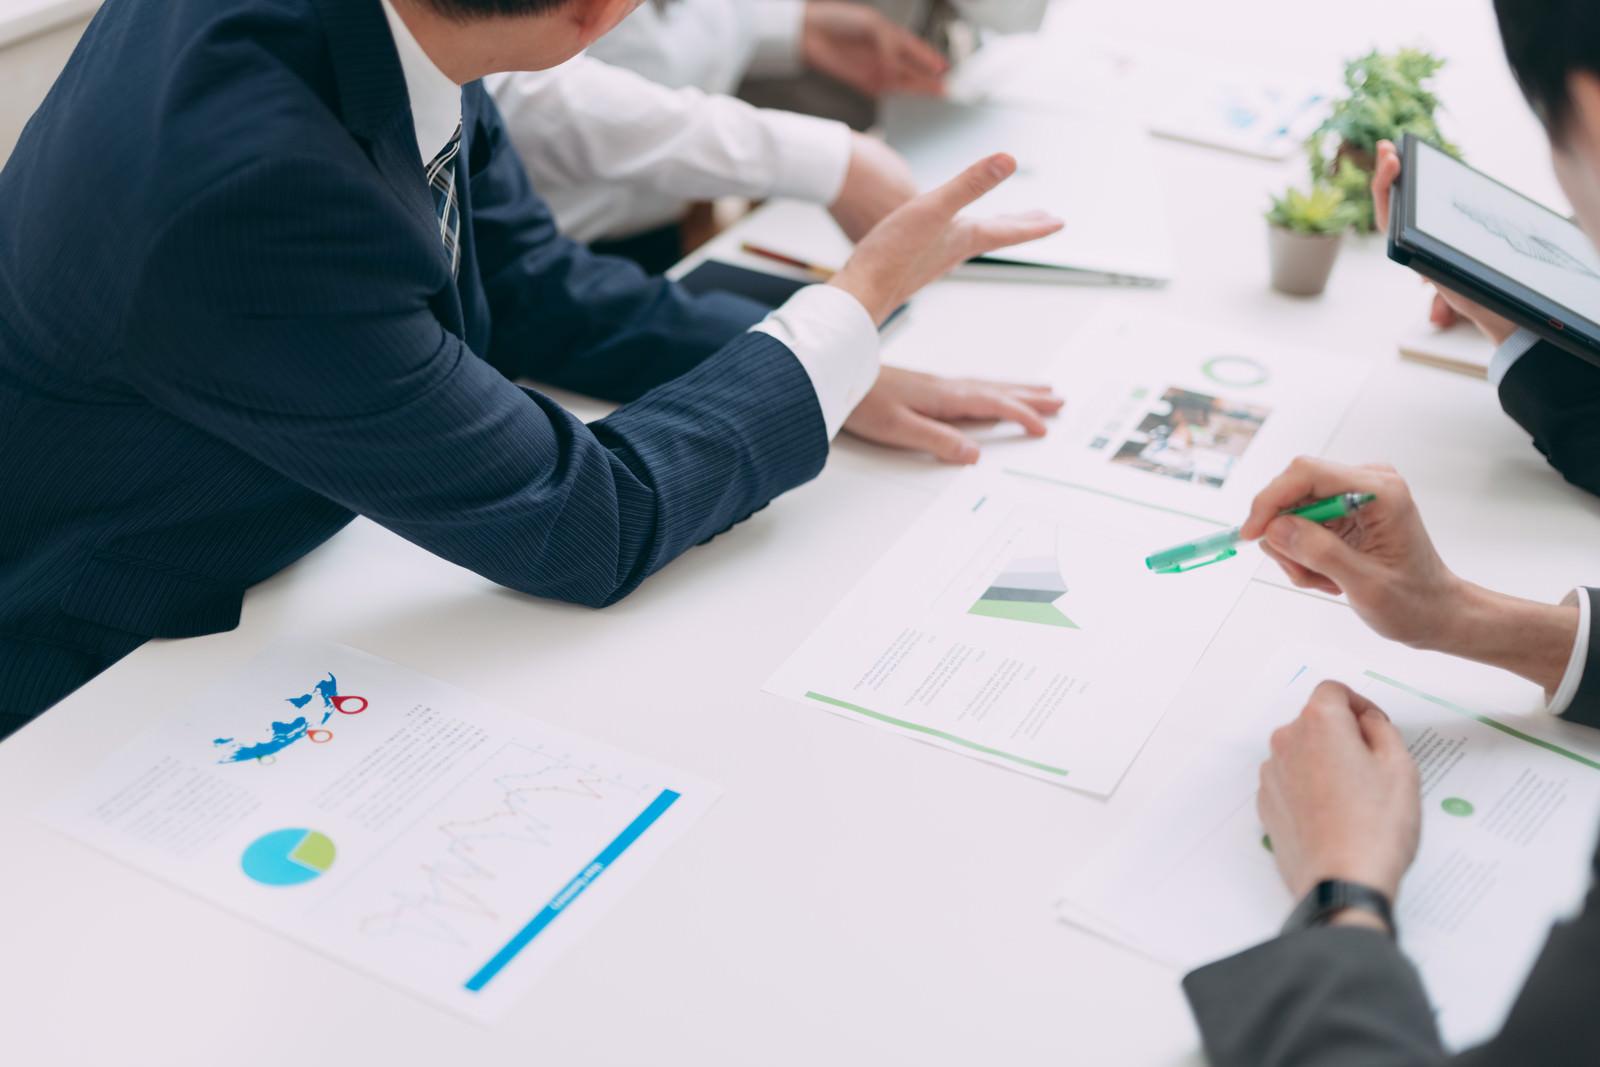 【PR】従業員の教育に悩む方におすすめ!社内勉強会「ロクゼロ」を徹底解説